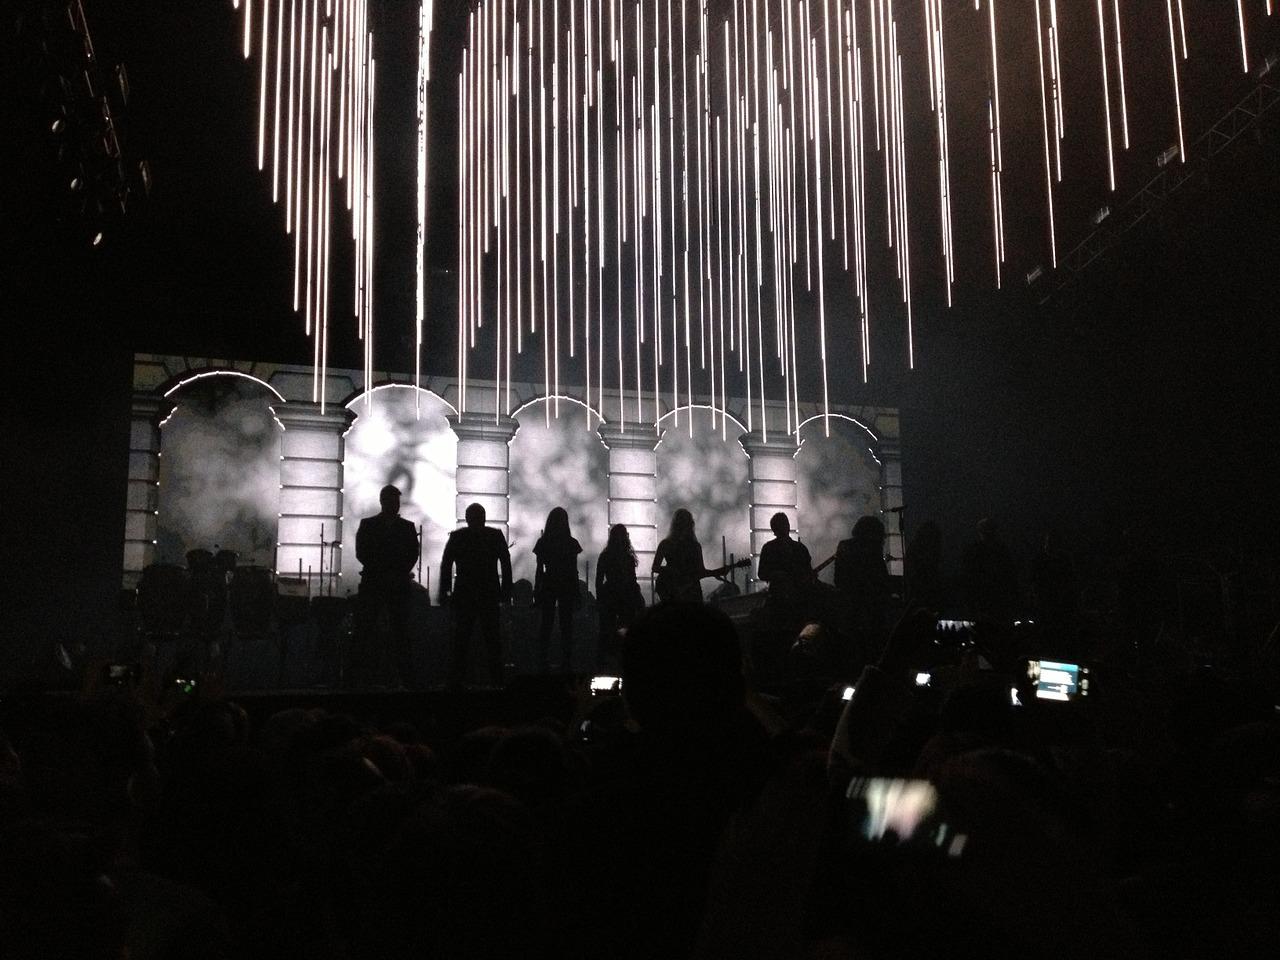 Nightlife_Concert_Bogota_Colombia_PD